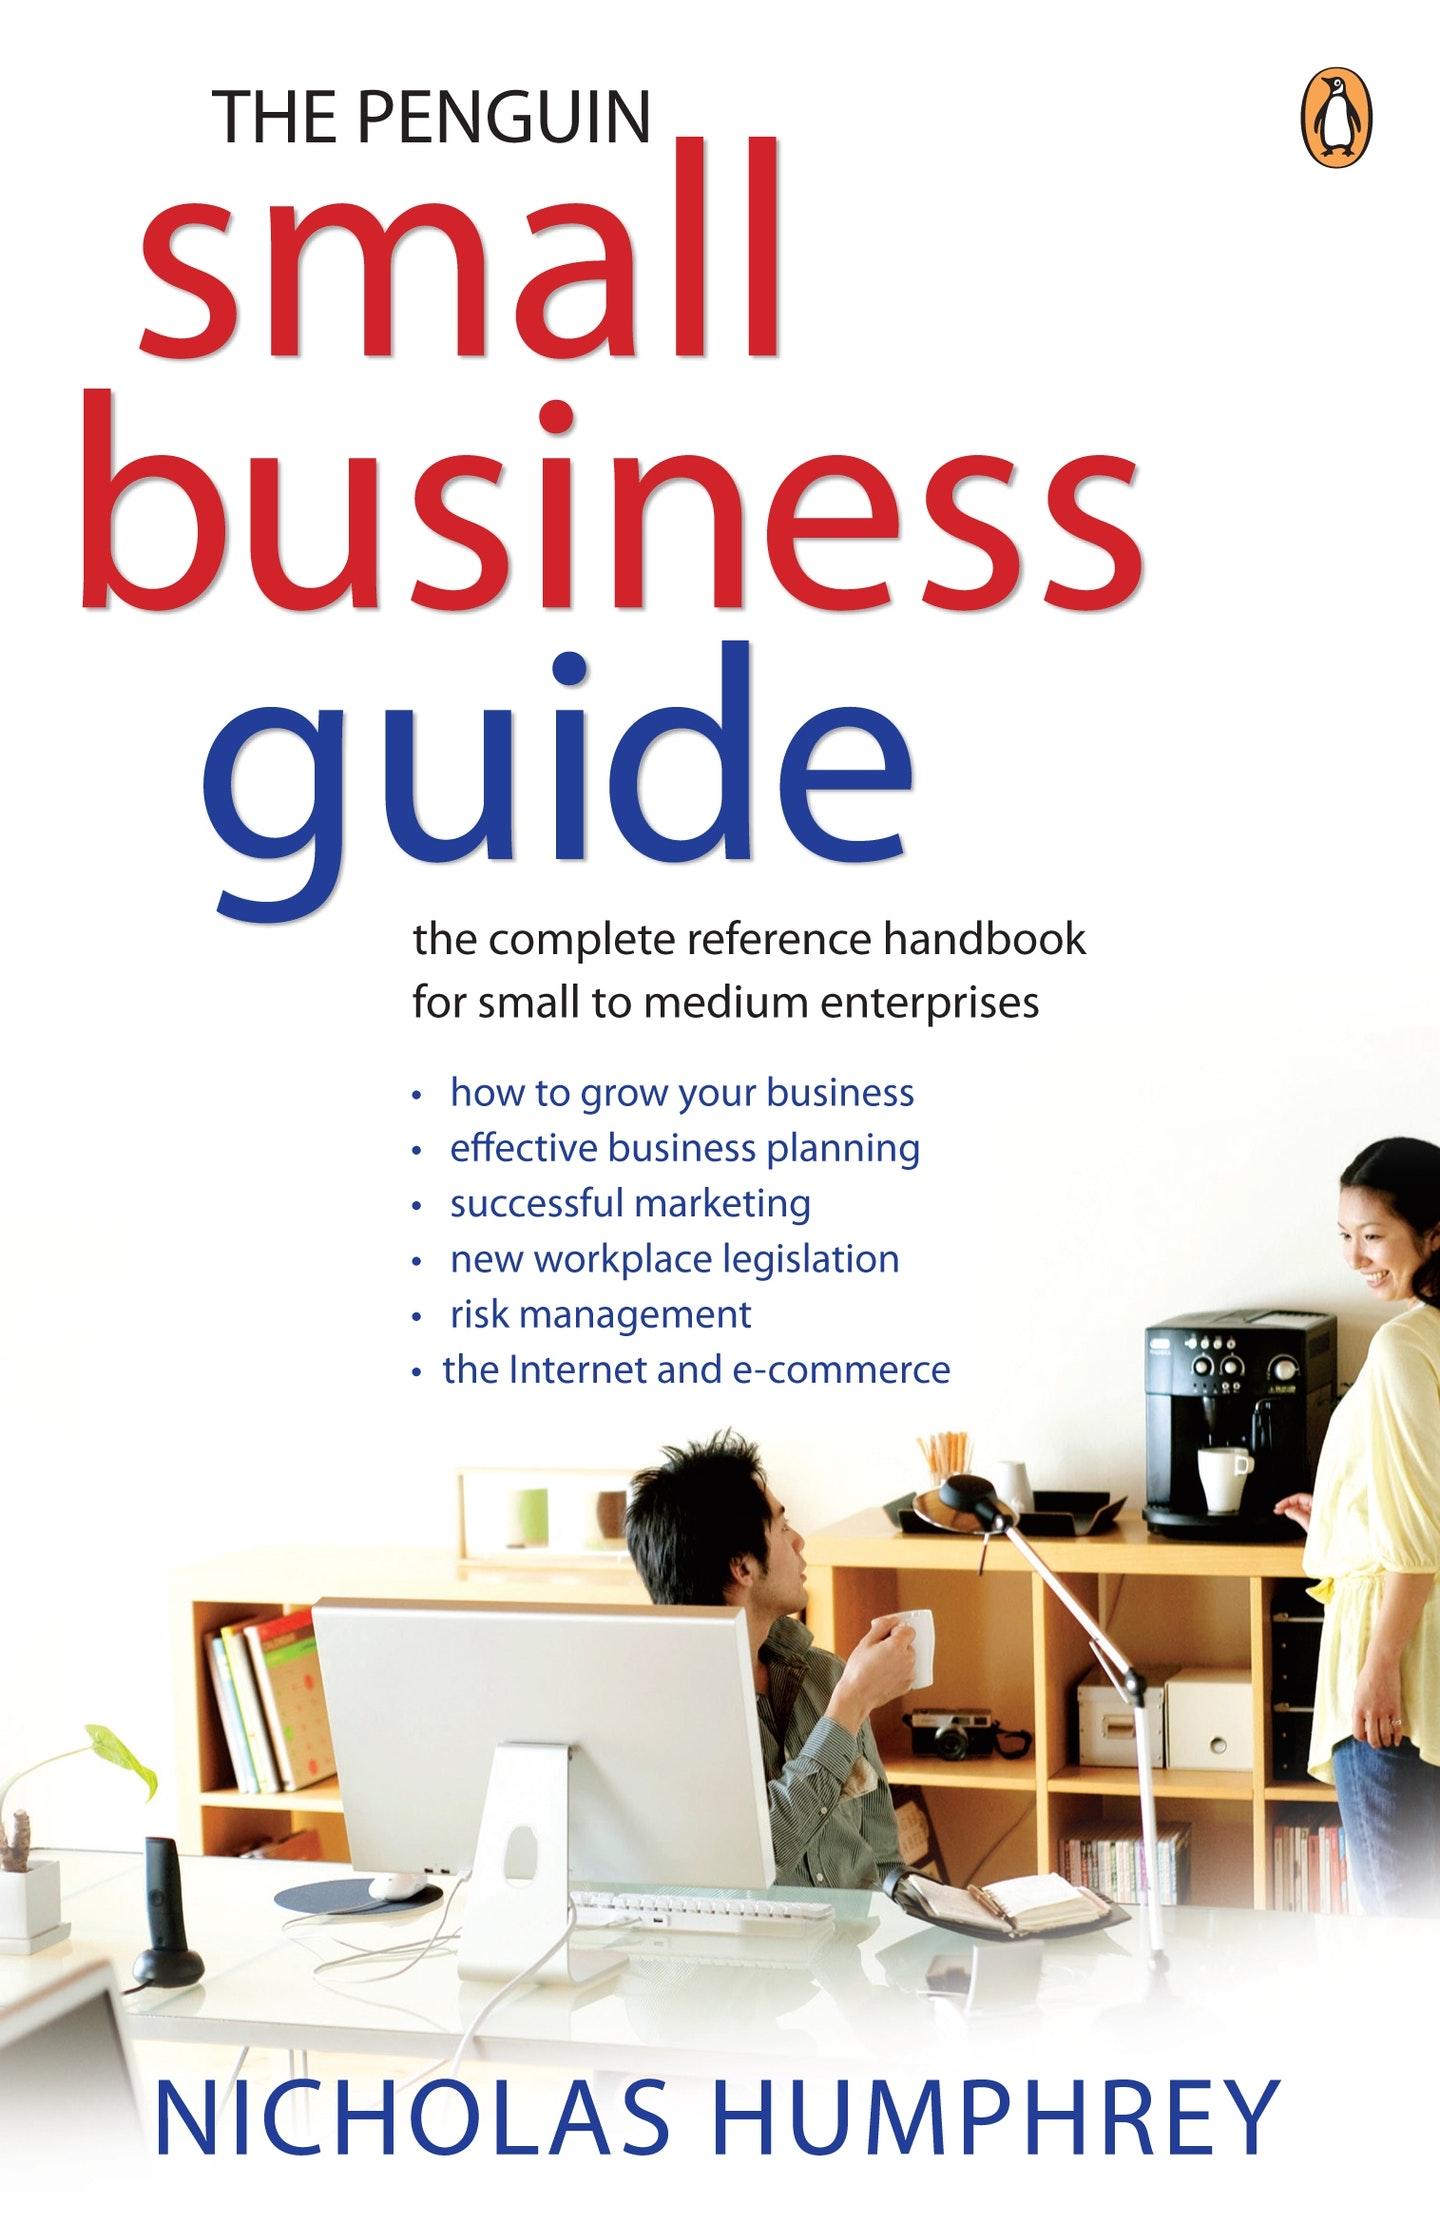 Business Agenda Small Medium Enterprises | Great Business Agenda Small Medium Enterprises Images Gallery Pre